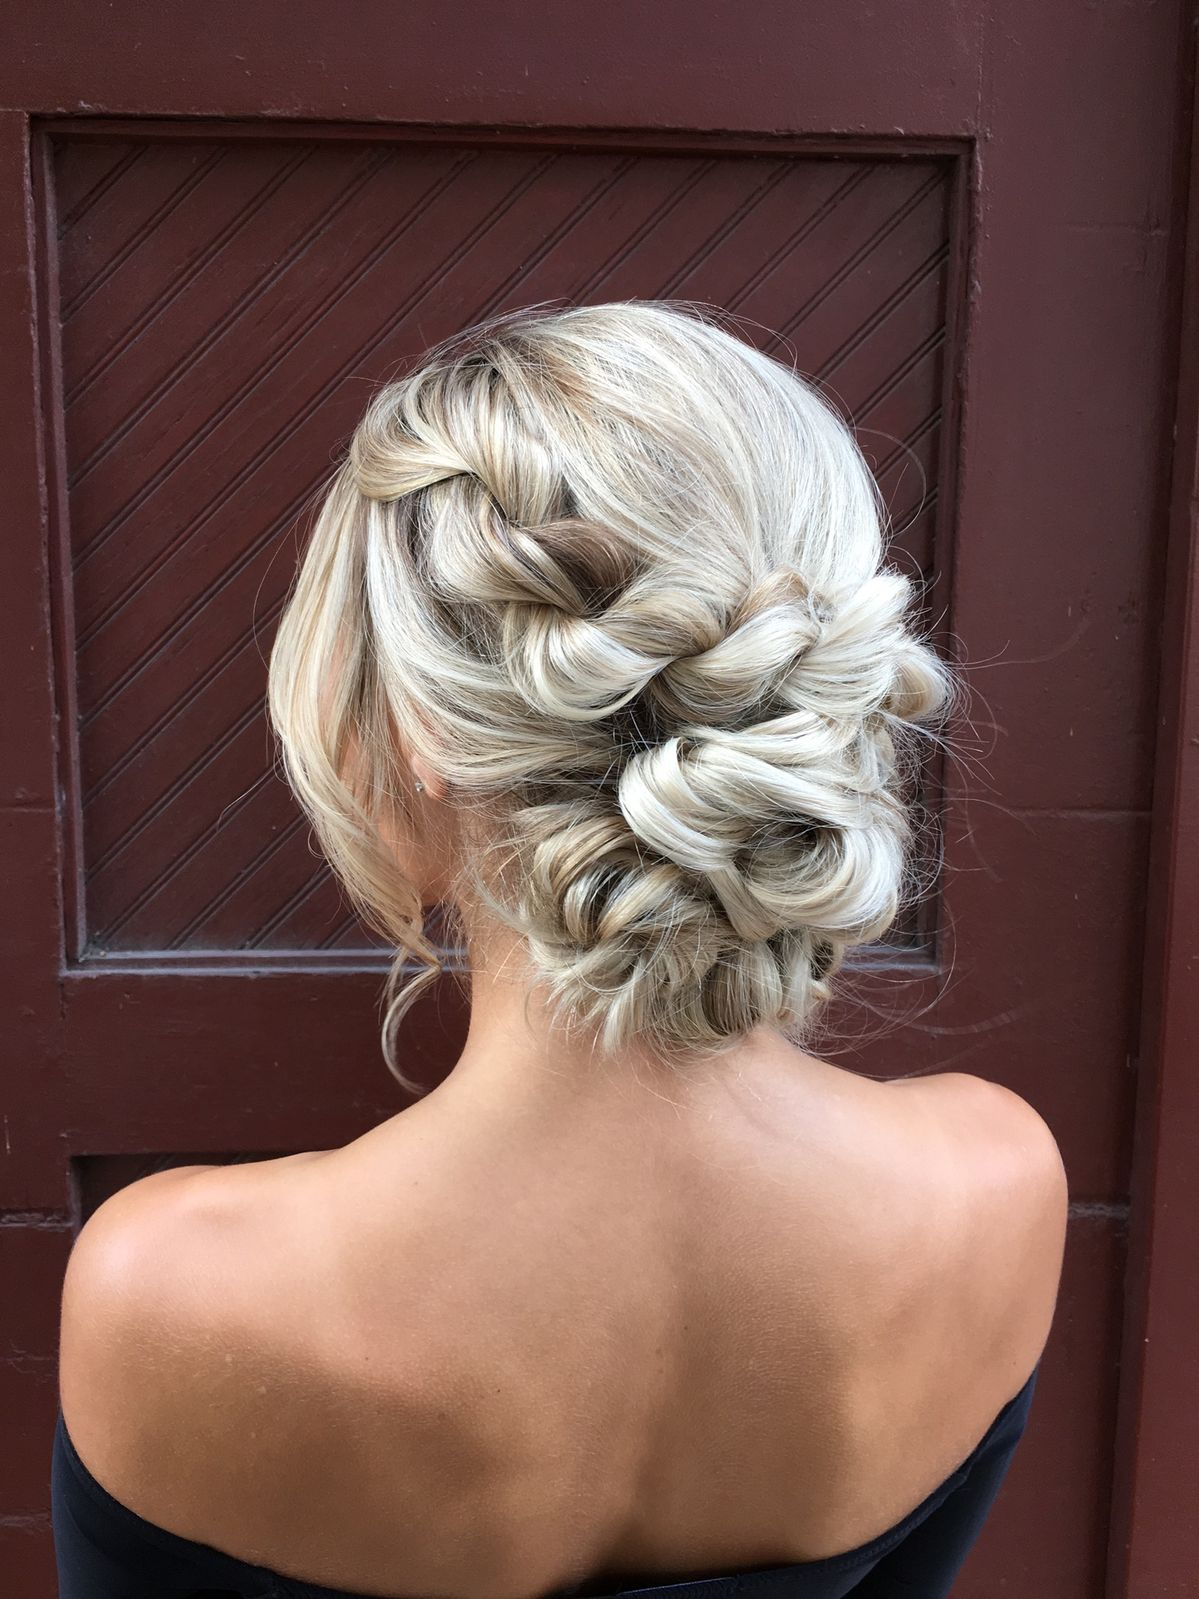 "elegant braided updo | hairstyle by goldplaited<p><a href=""http://www.homeinteriordesign.org/2018/02/short-guide-to-interior-decoration.html"">Short guide to interior decoration</a></p>"